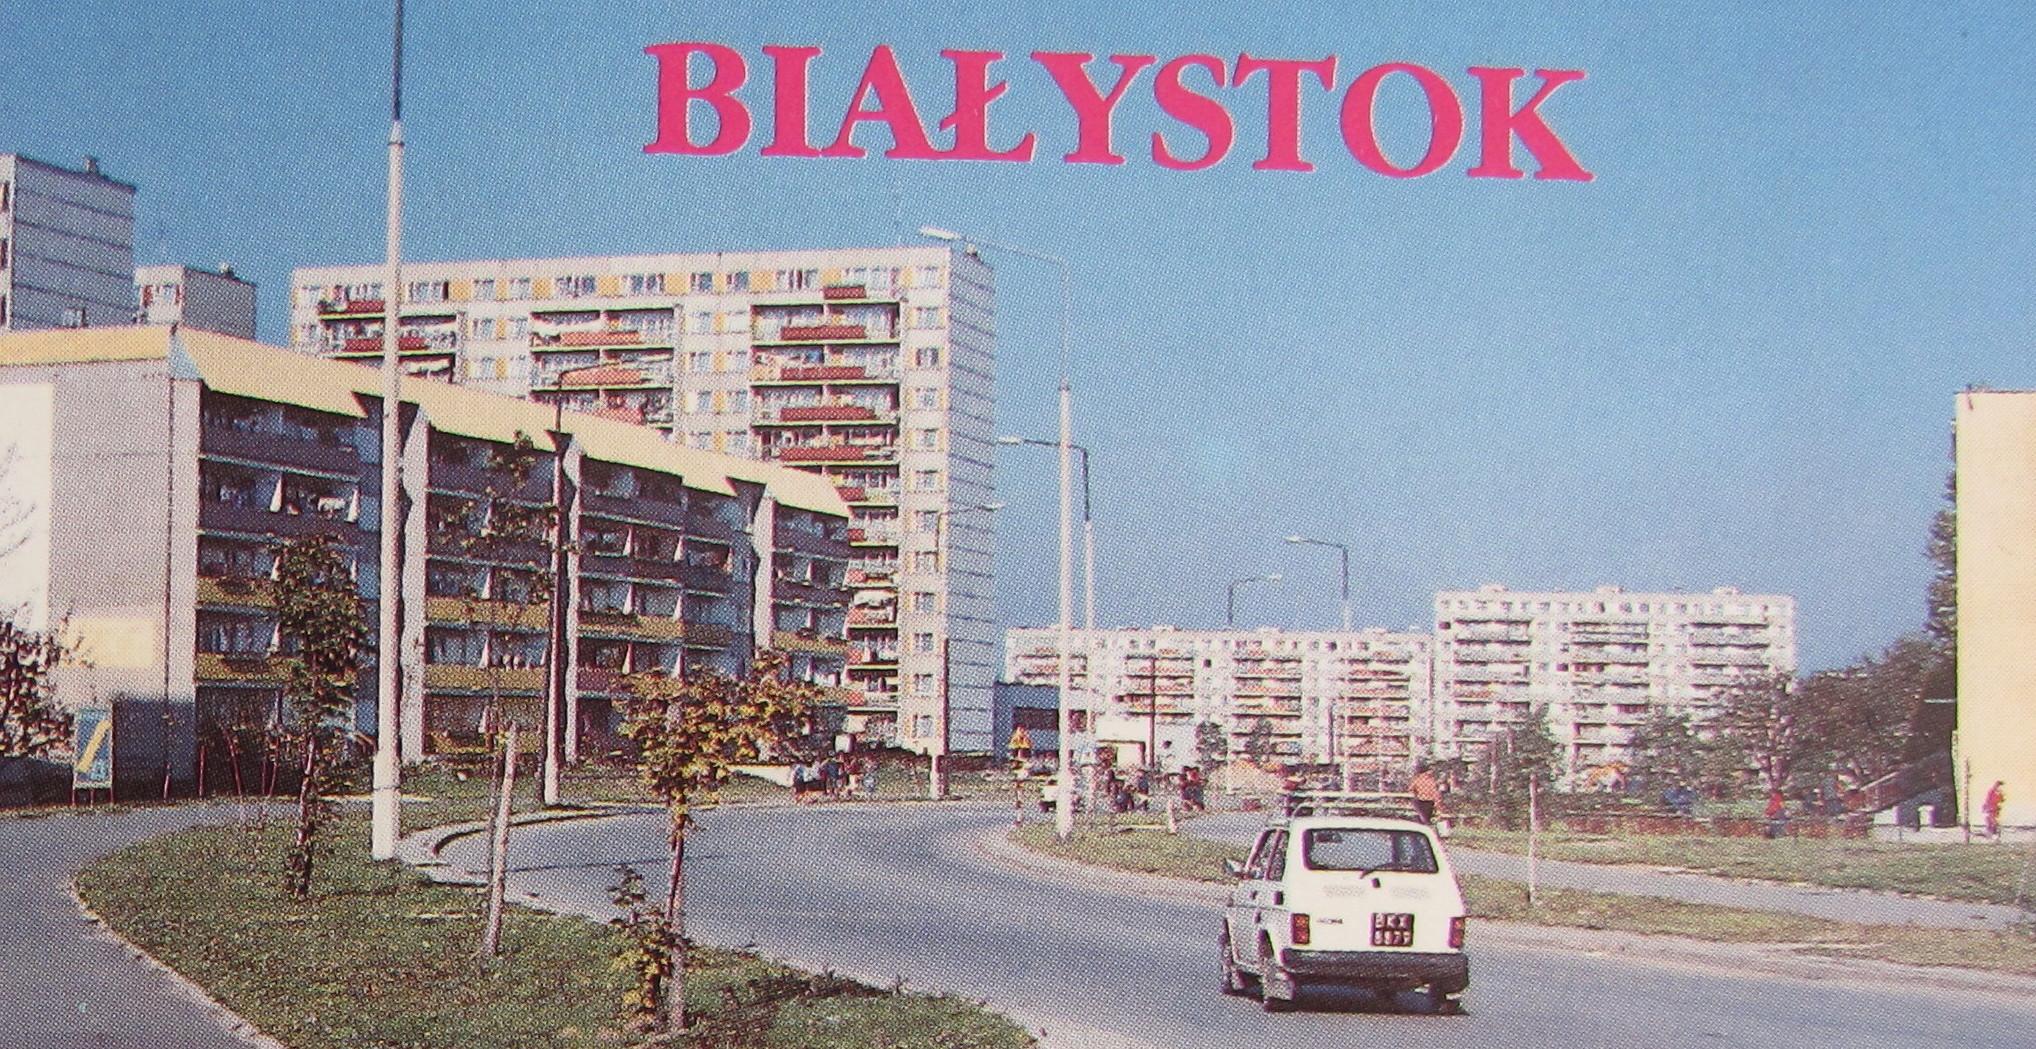 img_9439_bialostoczek